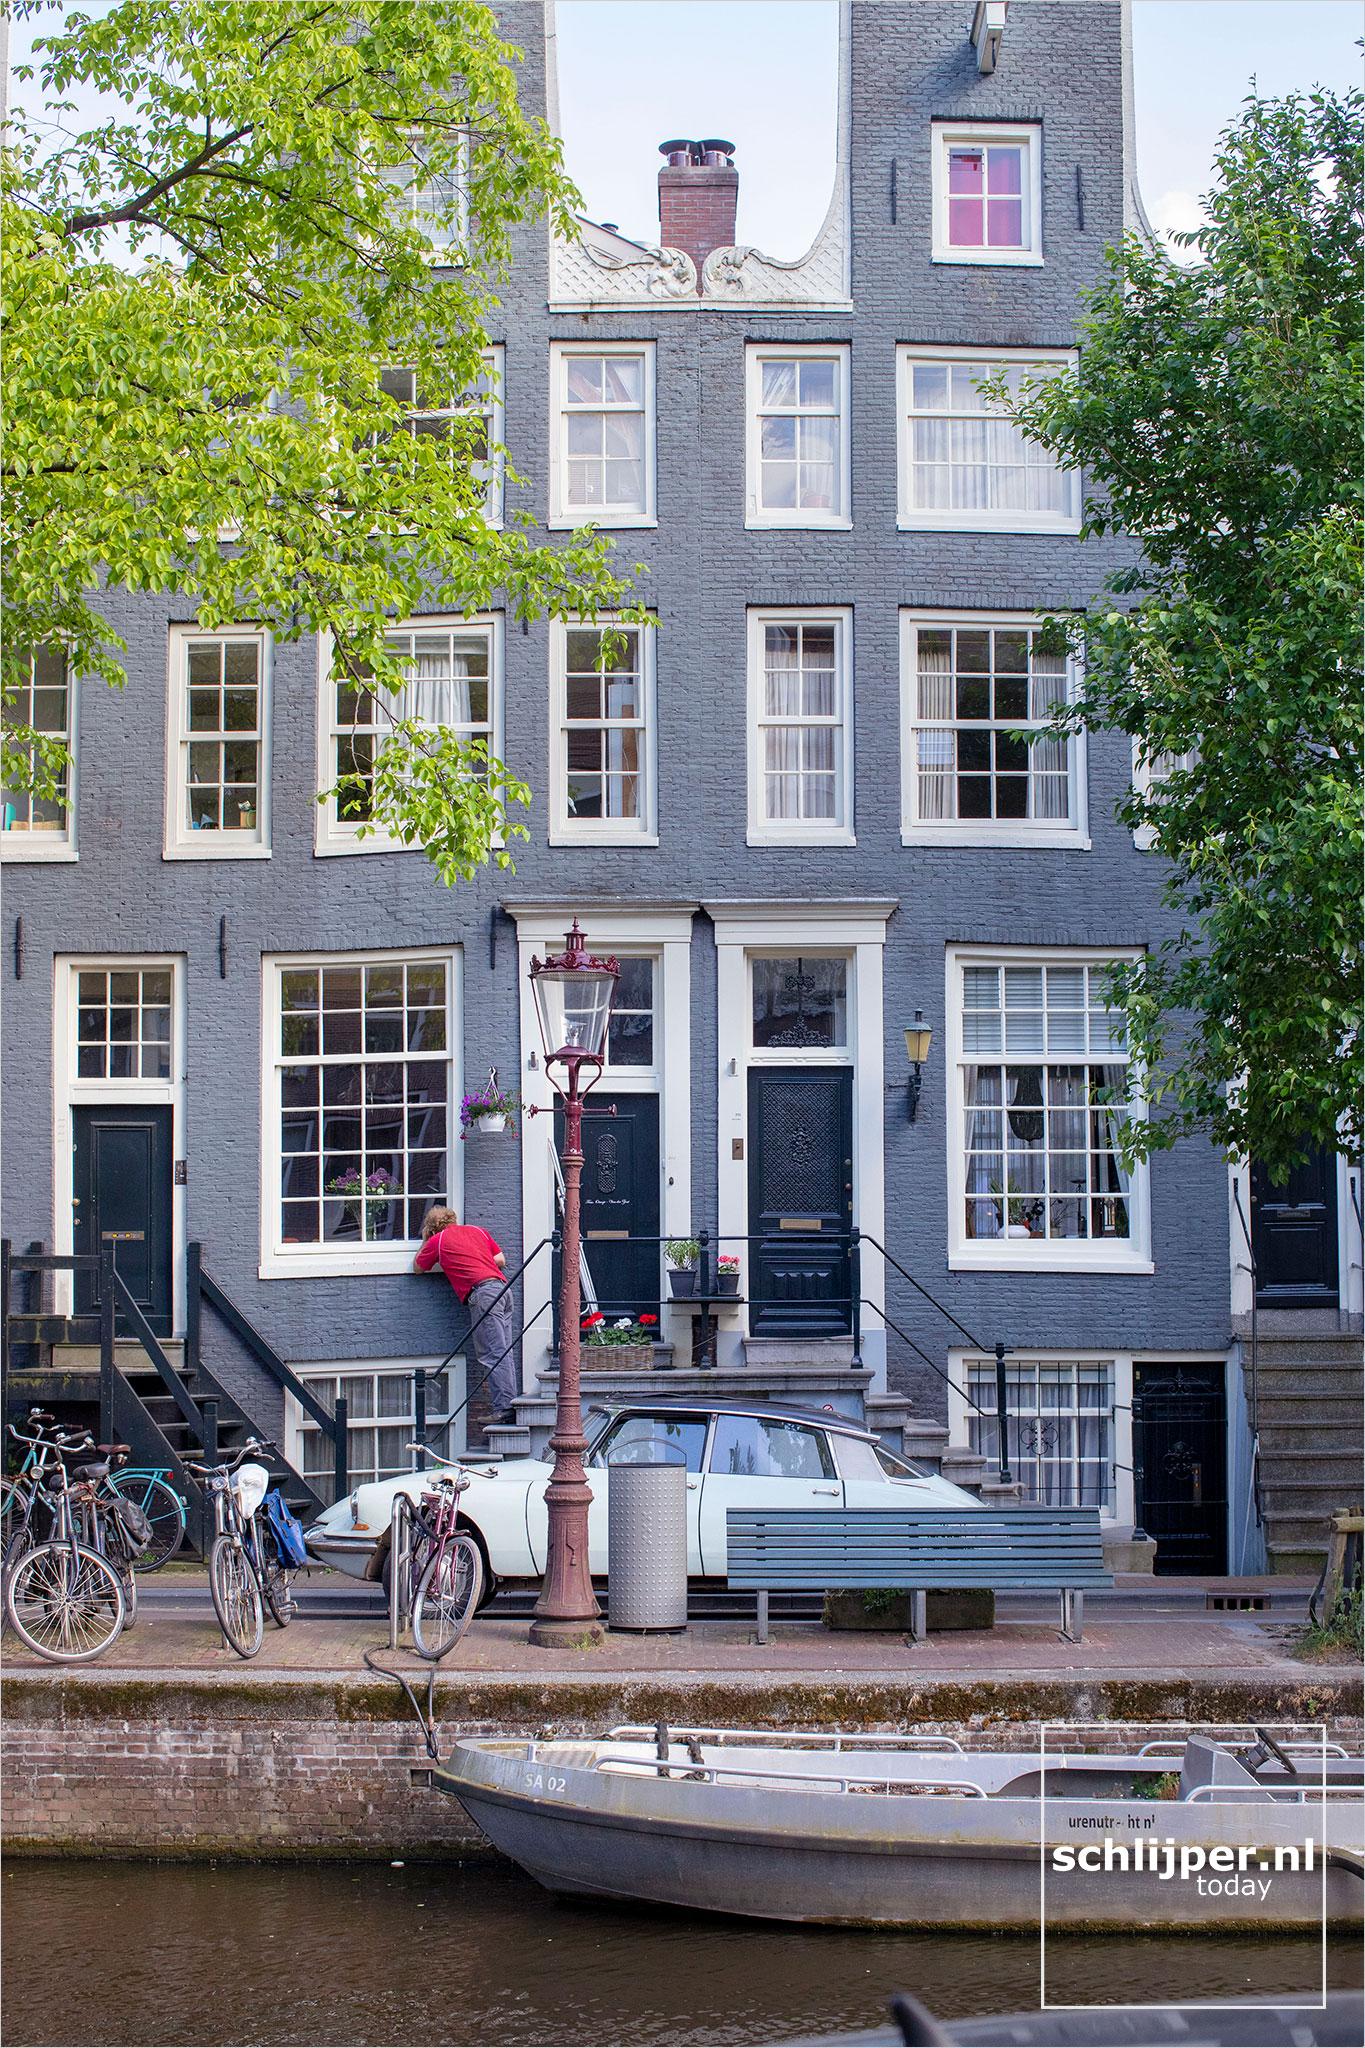 Nederland, Amsterdam, 23 mei 2020